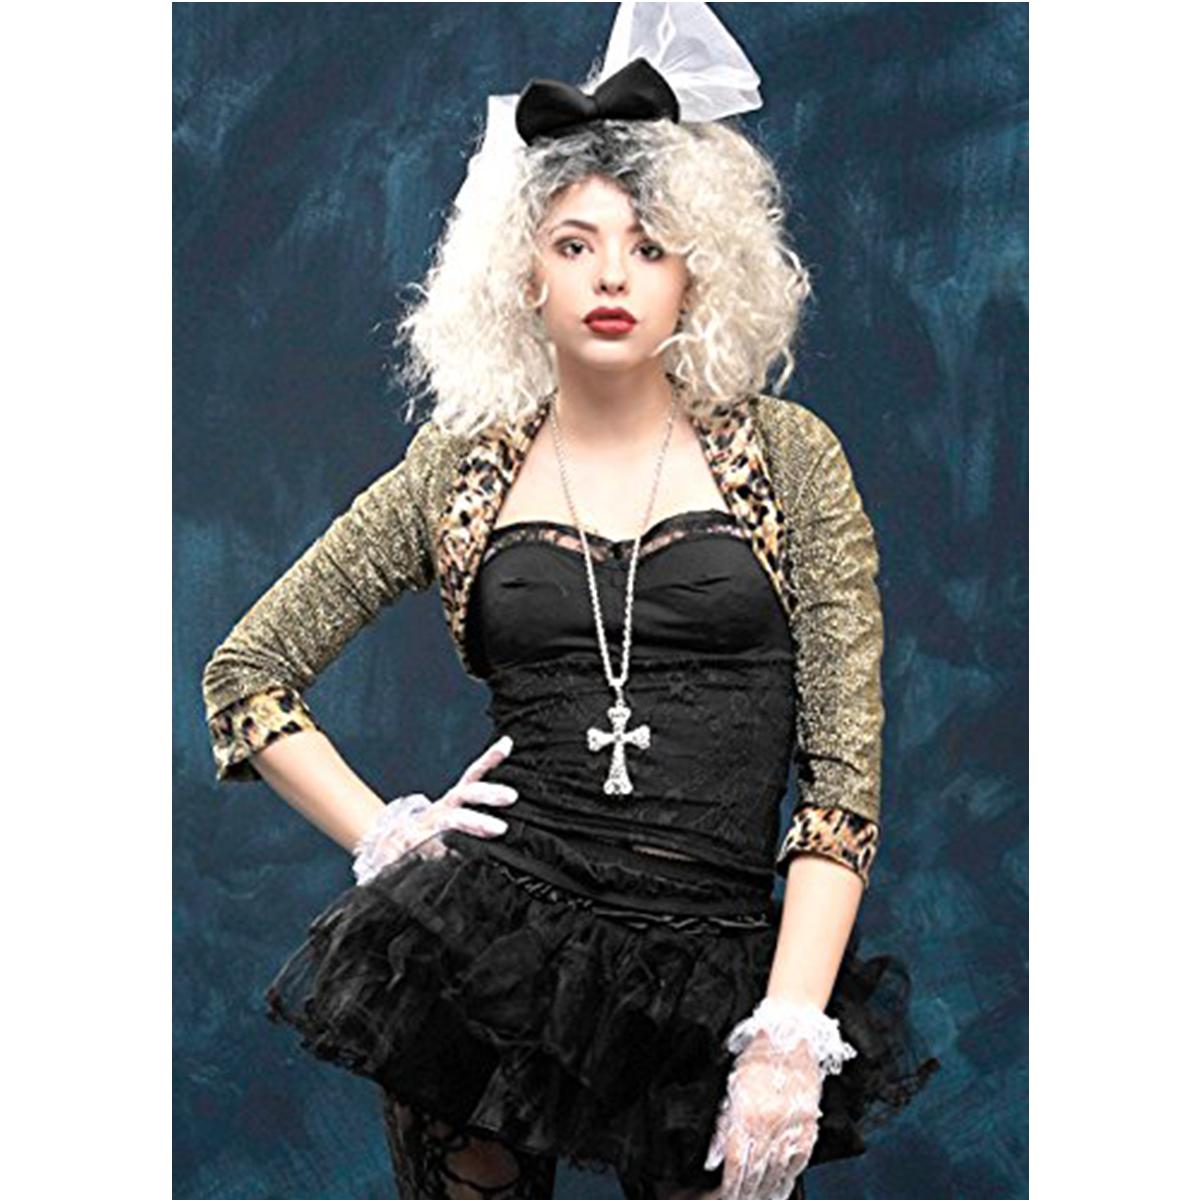 test wild child costume ann e 80 style madona d guisement pour adolescentes. Black Bedroom Furniture Sets. Home Design Ideas